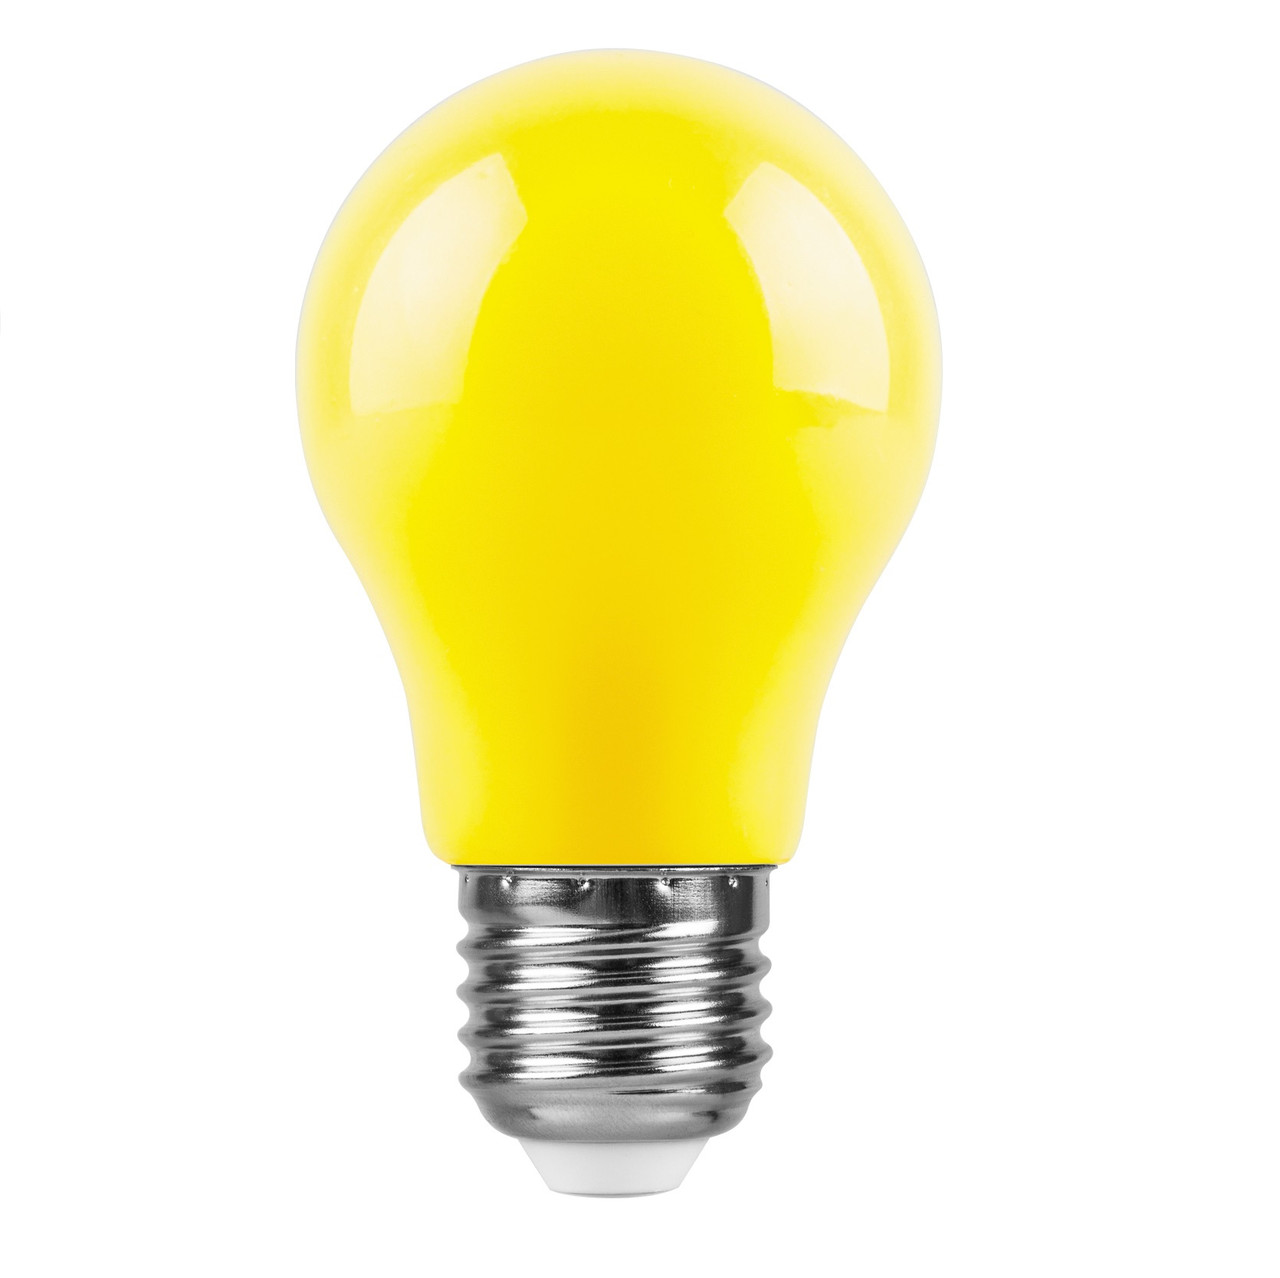 Светодиодная лампа Feron LB-375 A50 230V 3W E27 желтая